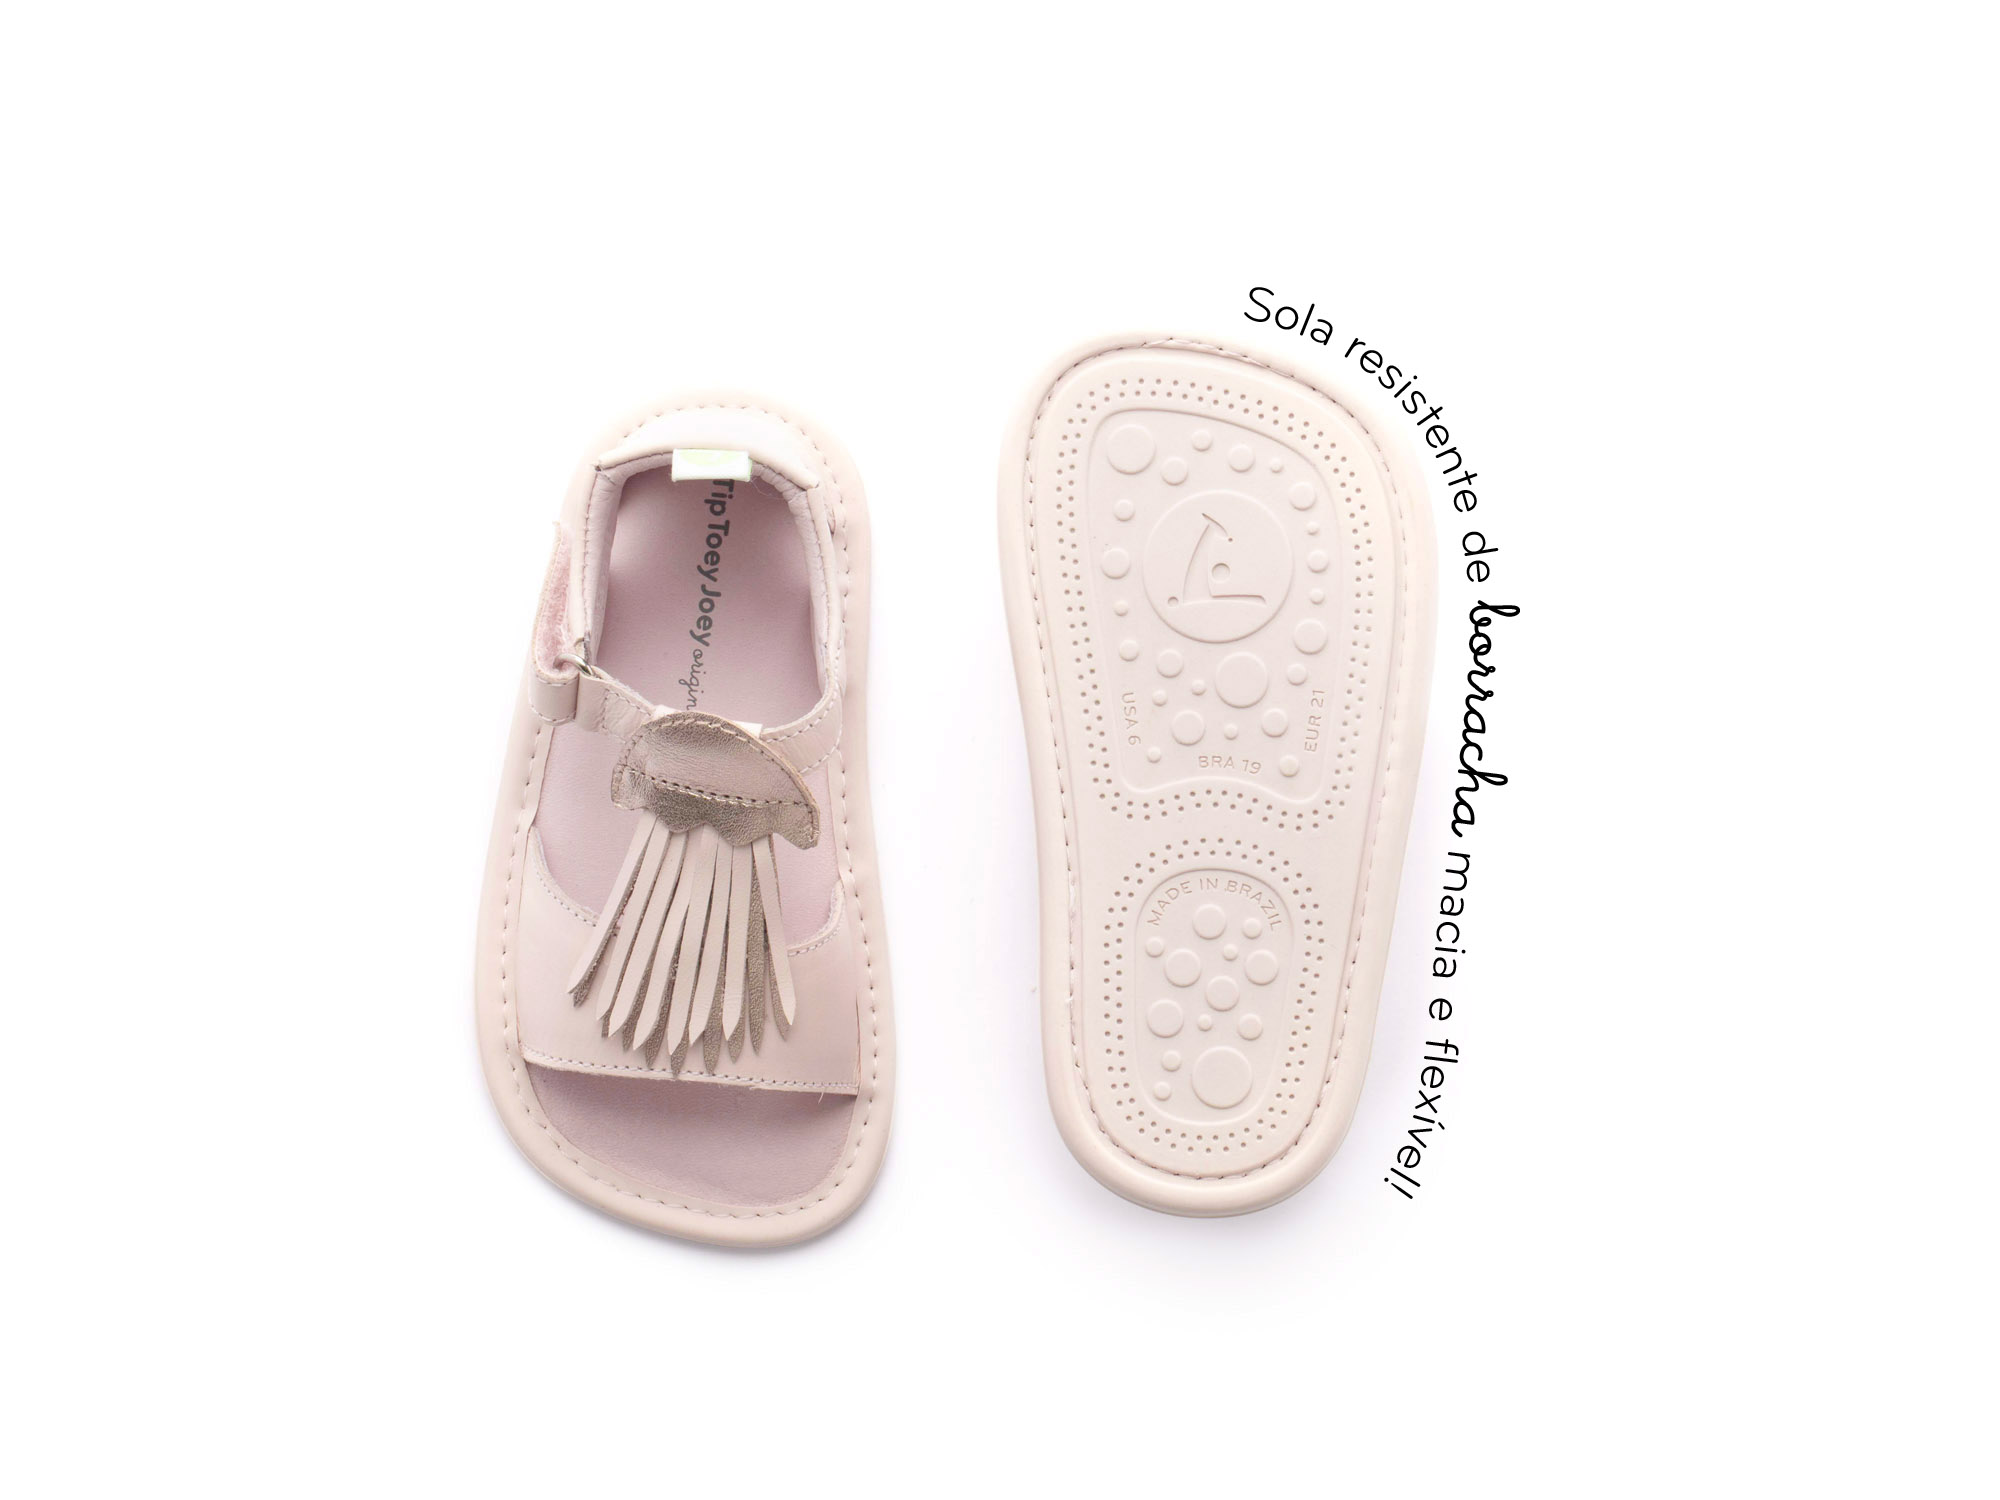 sandalia Bebê feminino jellyfishy